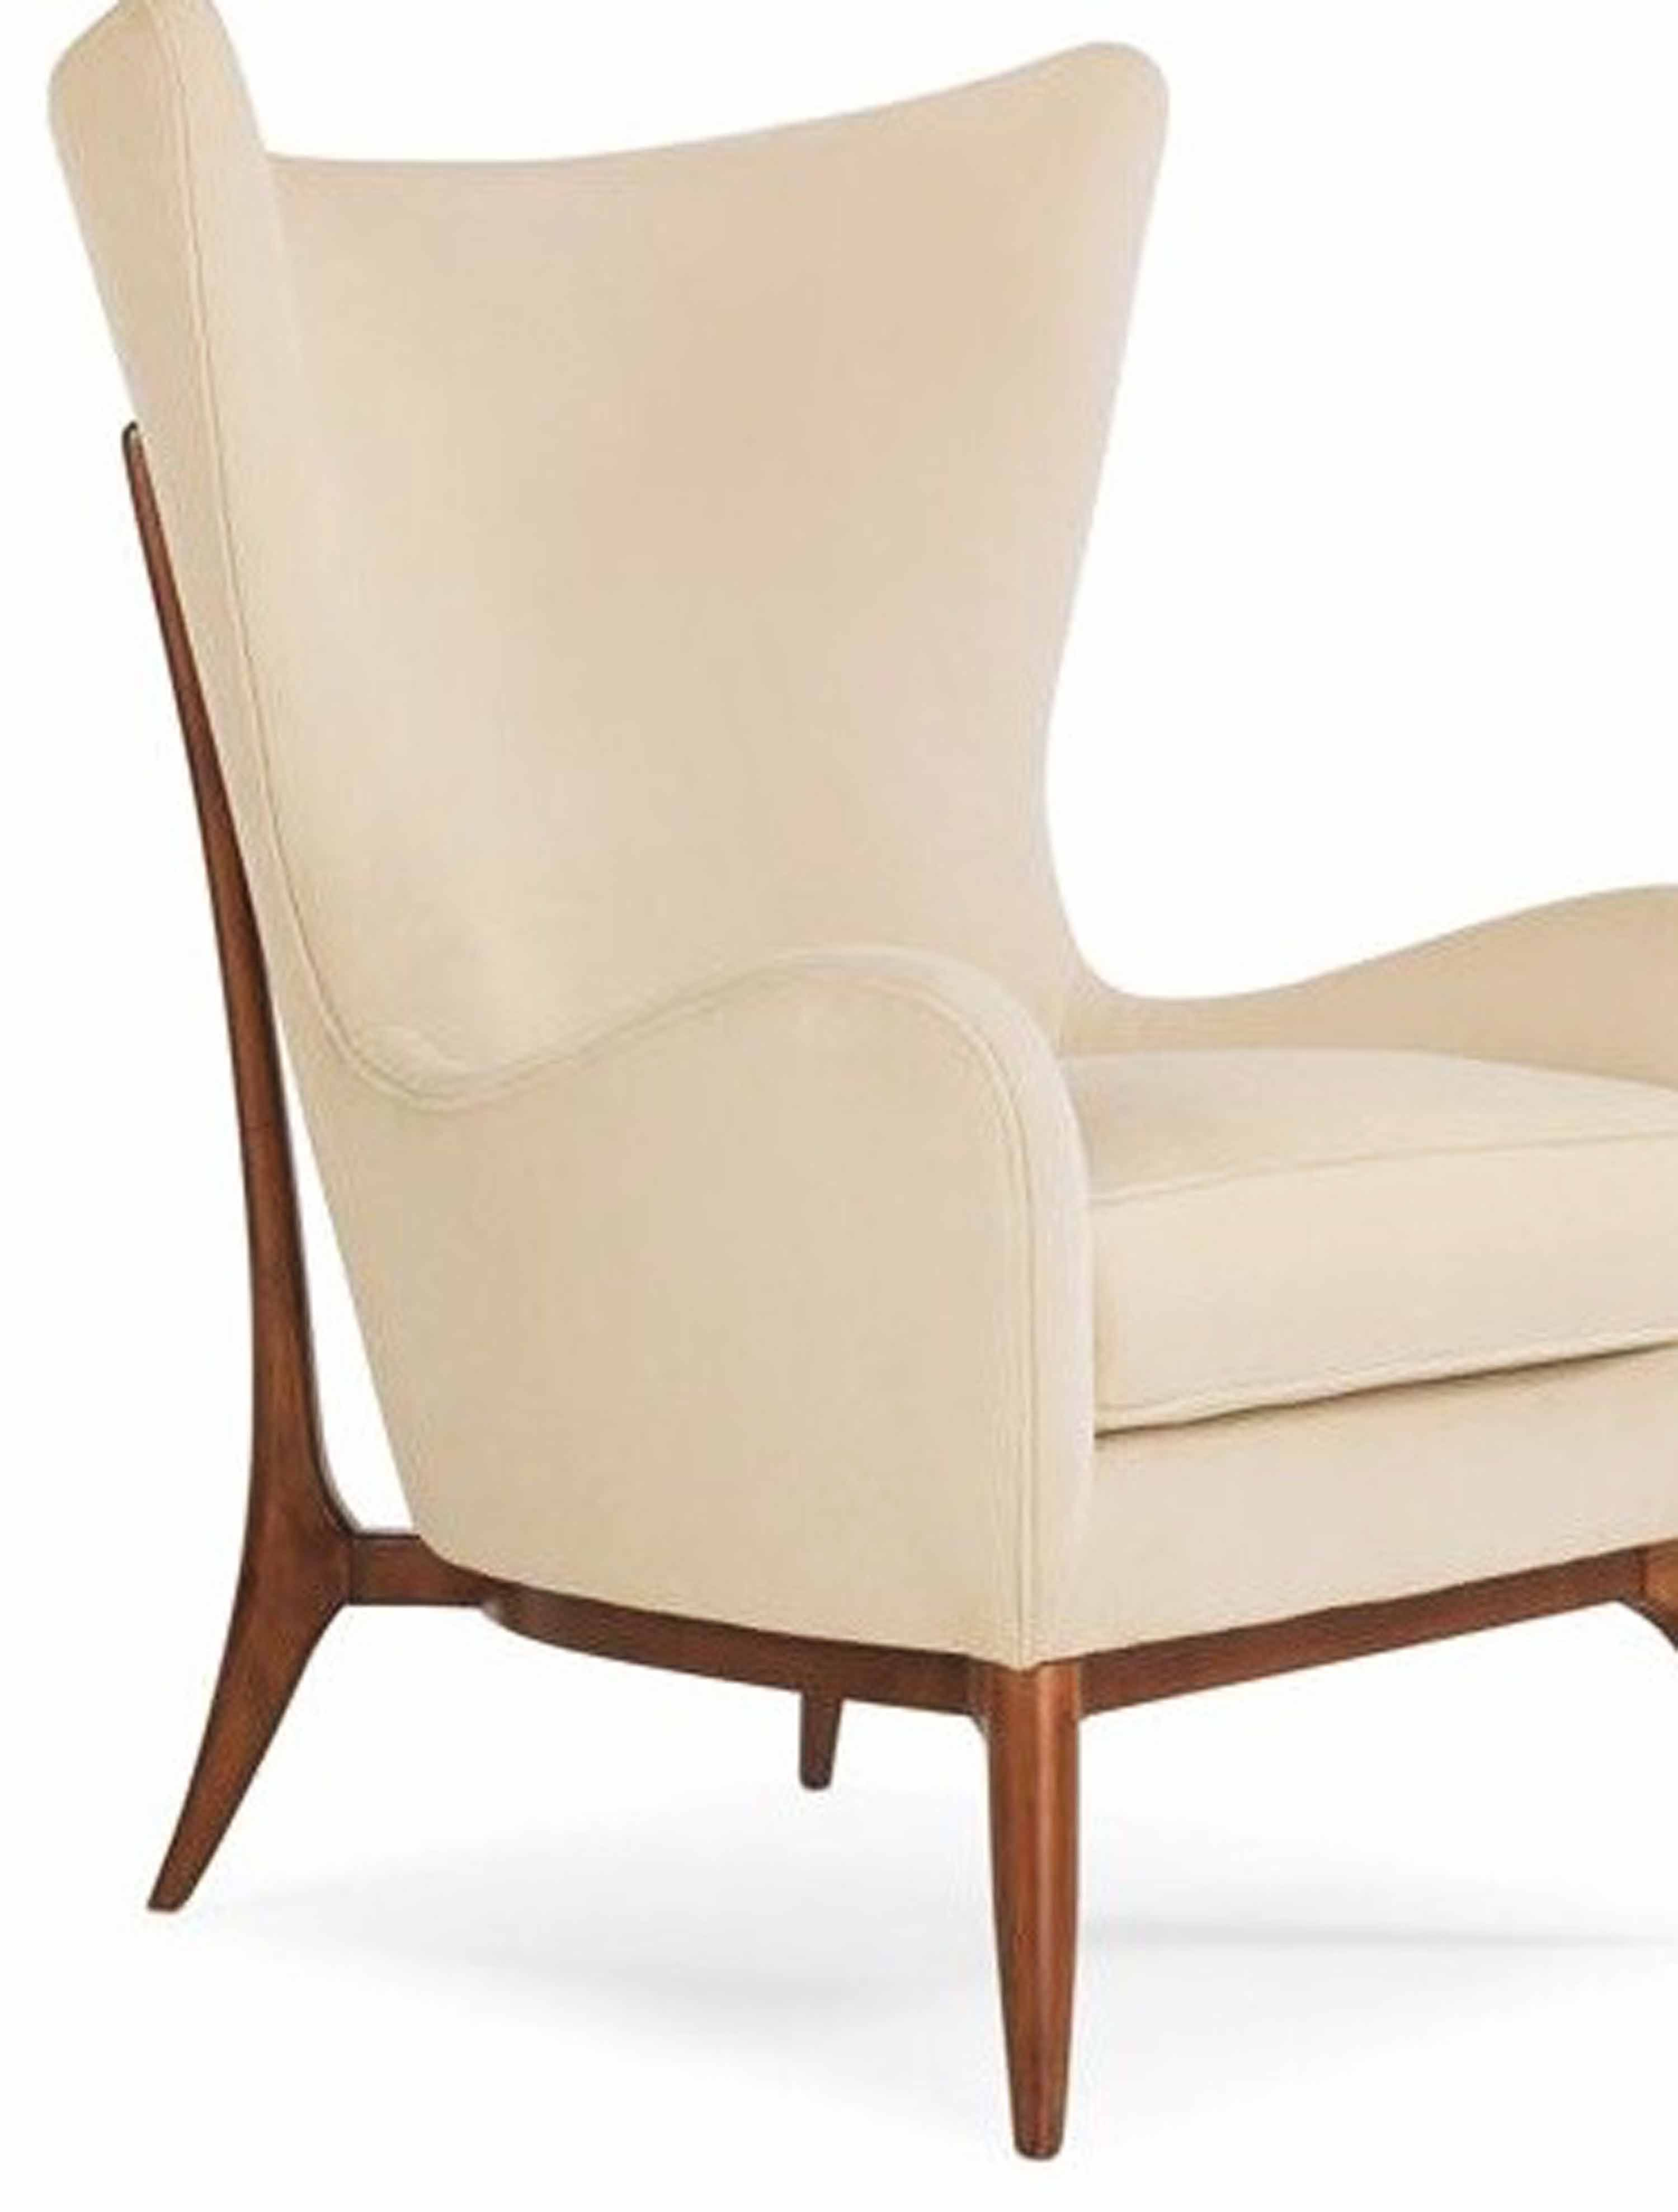 Furniture & Furnishing Modern Living Room Chairs Greek Danish ...